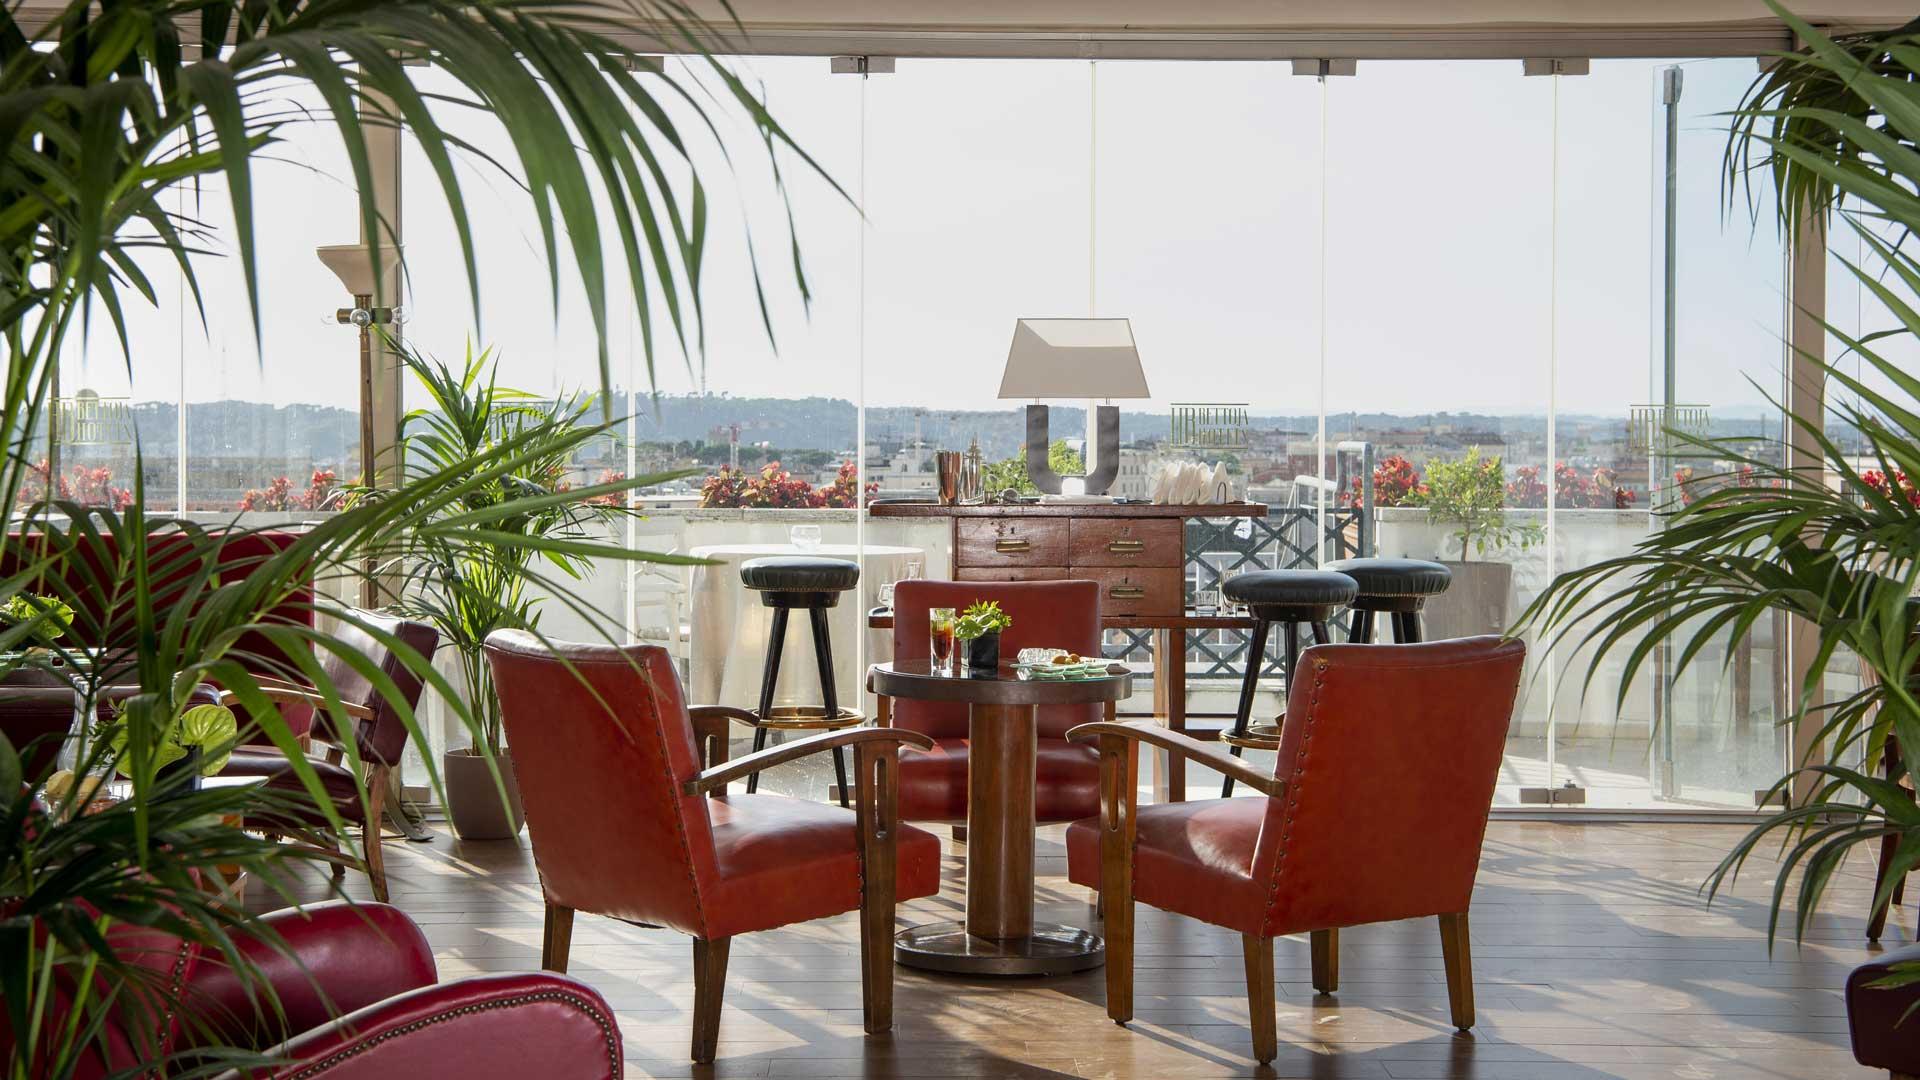 Ligea-Lounge-Bar-Bettoja-Hotel-Mediterraneo-Coqtai-Milano